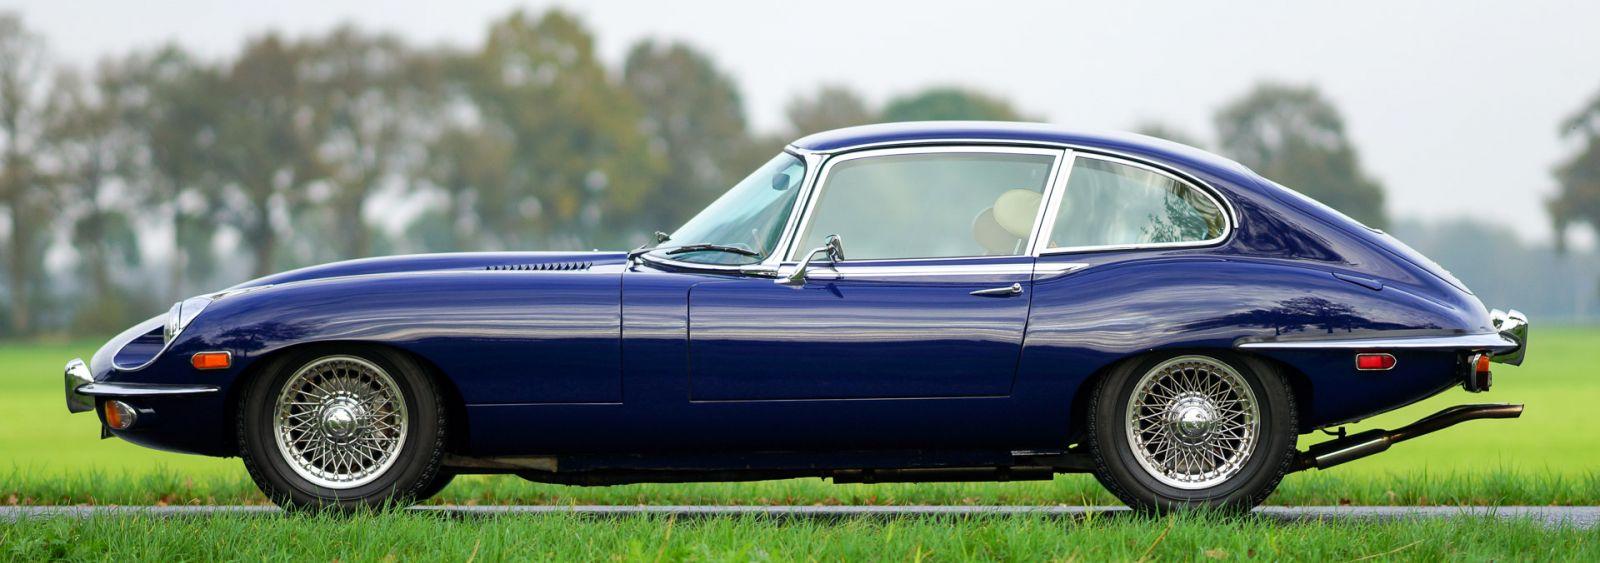 Jaguar Etype 42 FHC 1969  Welcome to ClassiCarGarage